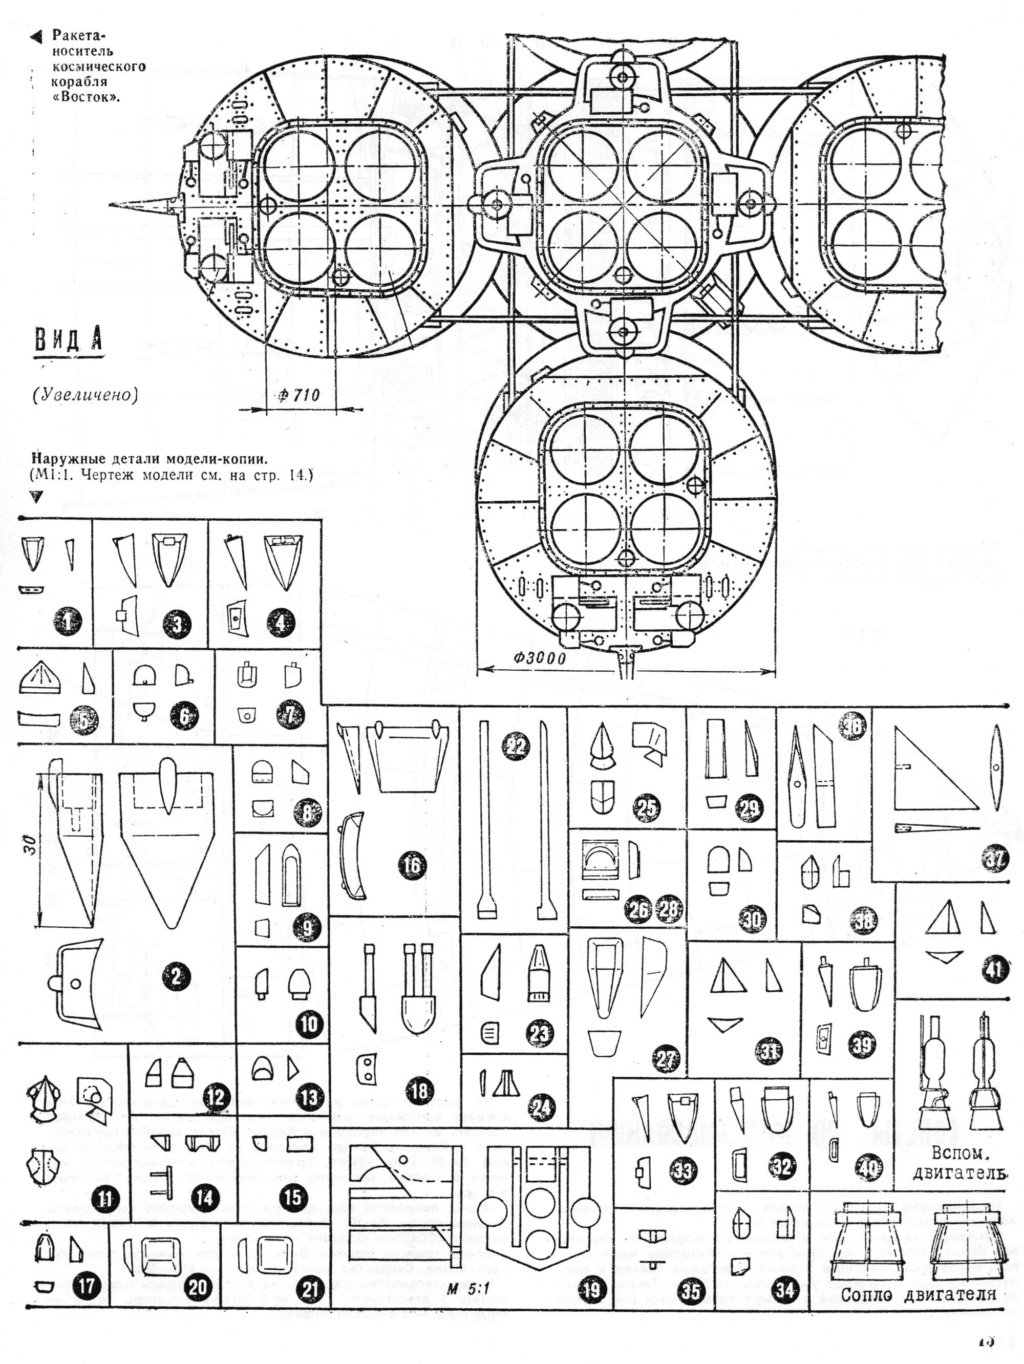 Vostok R7 Vostok16